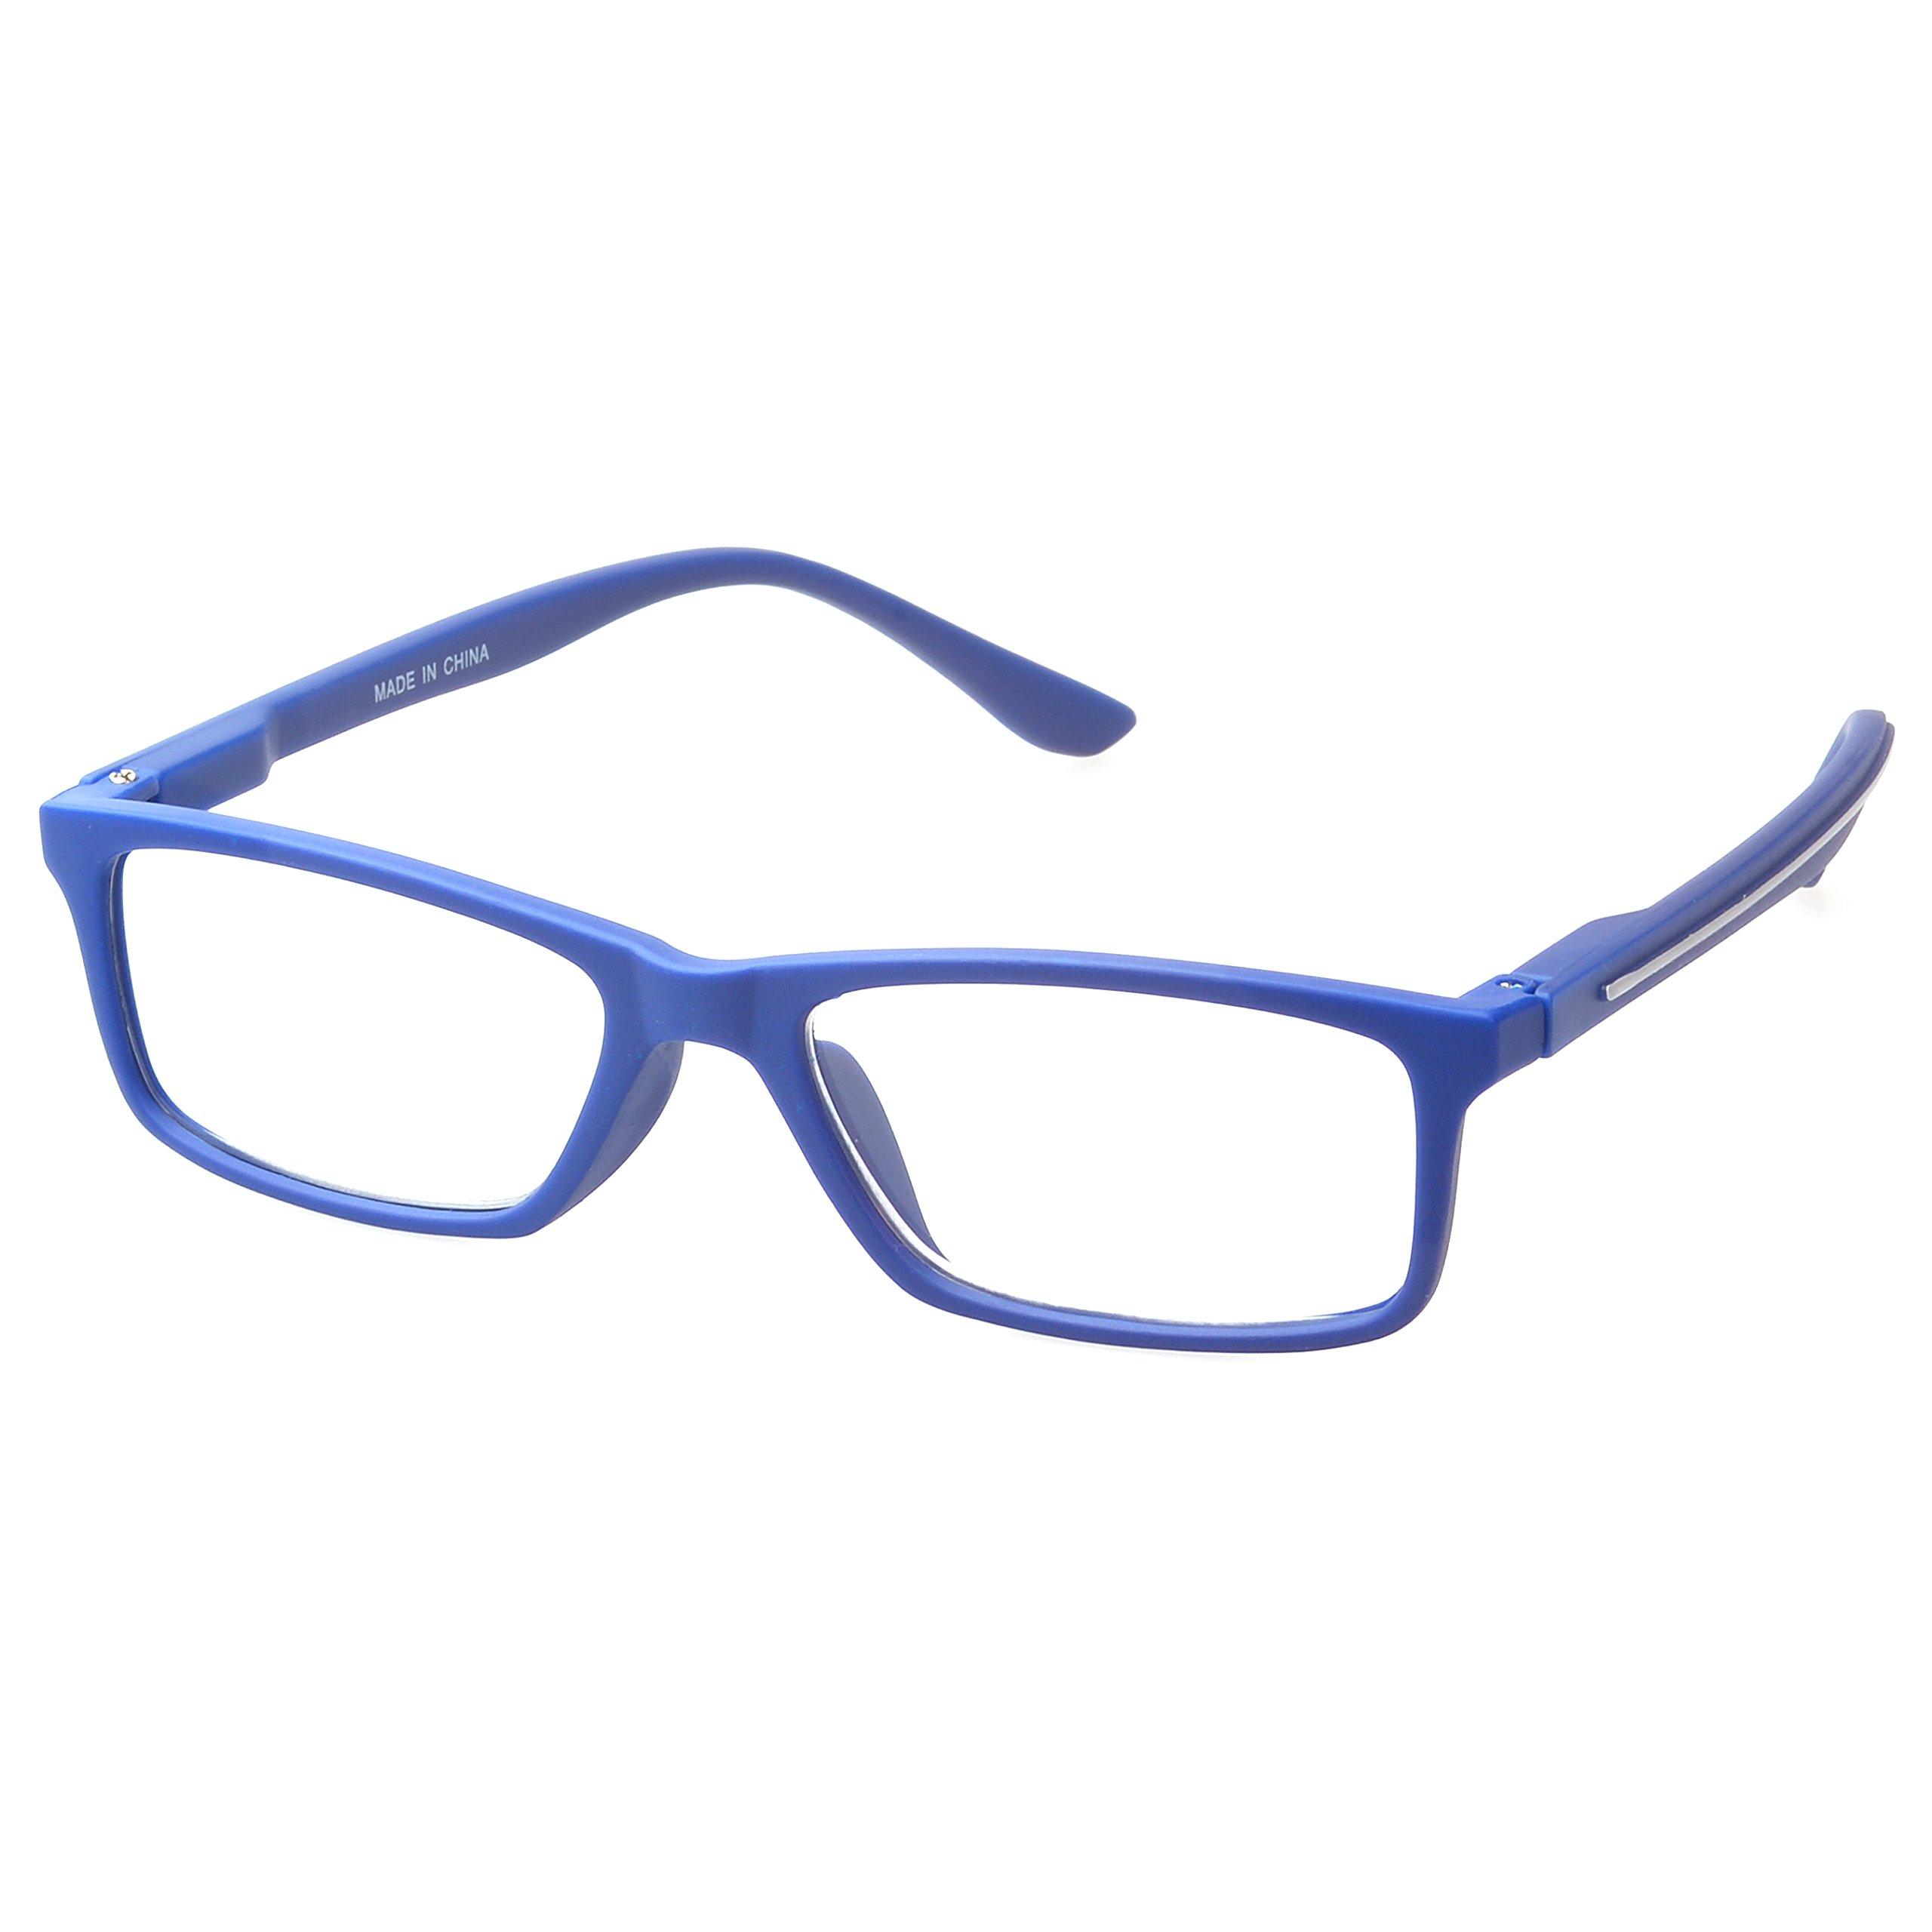 MLC Eyewear ® 'Avon' Rectangle Reading Glasses +1.50 in Blue